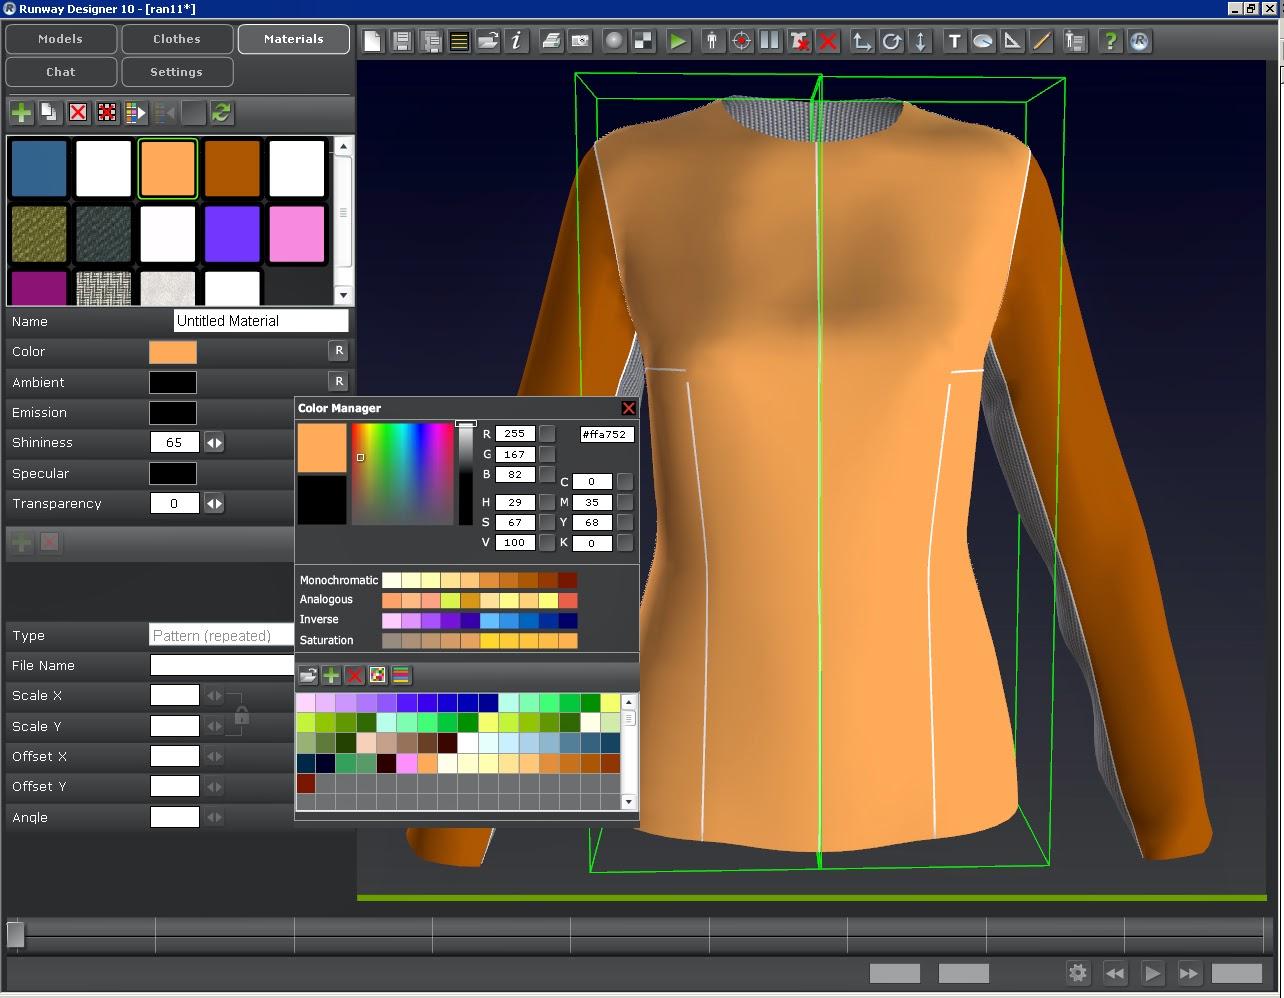 optitex virtual product 3d fashion design software download. Black Bedroom Furniture Sets. Home Design Ideas